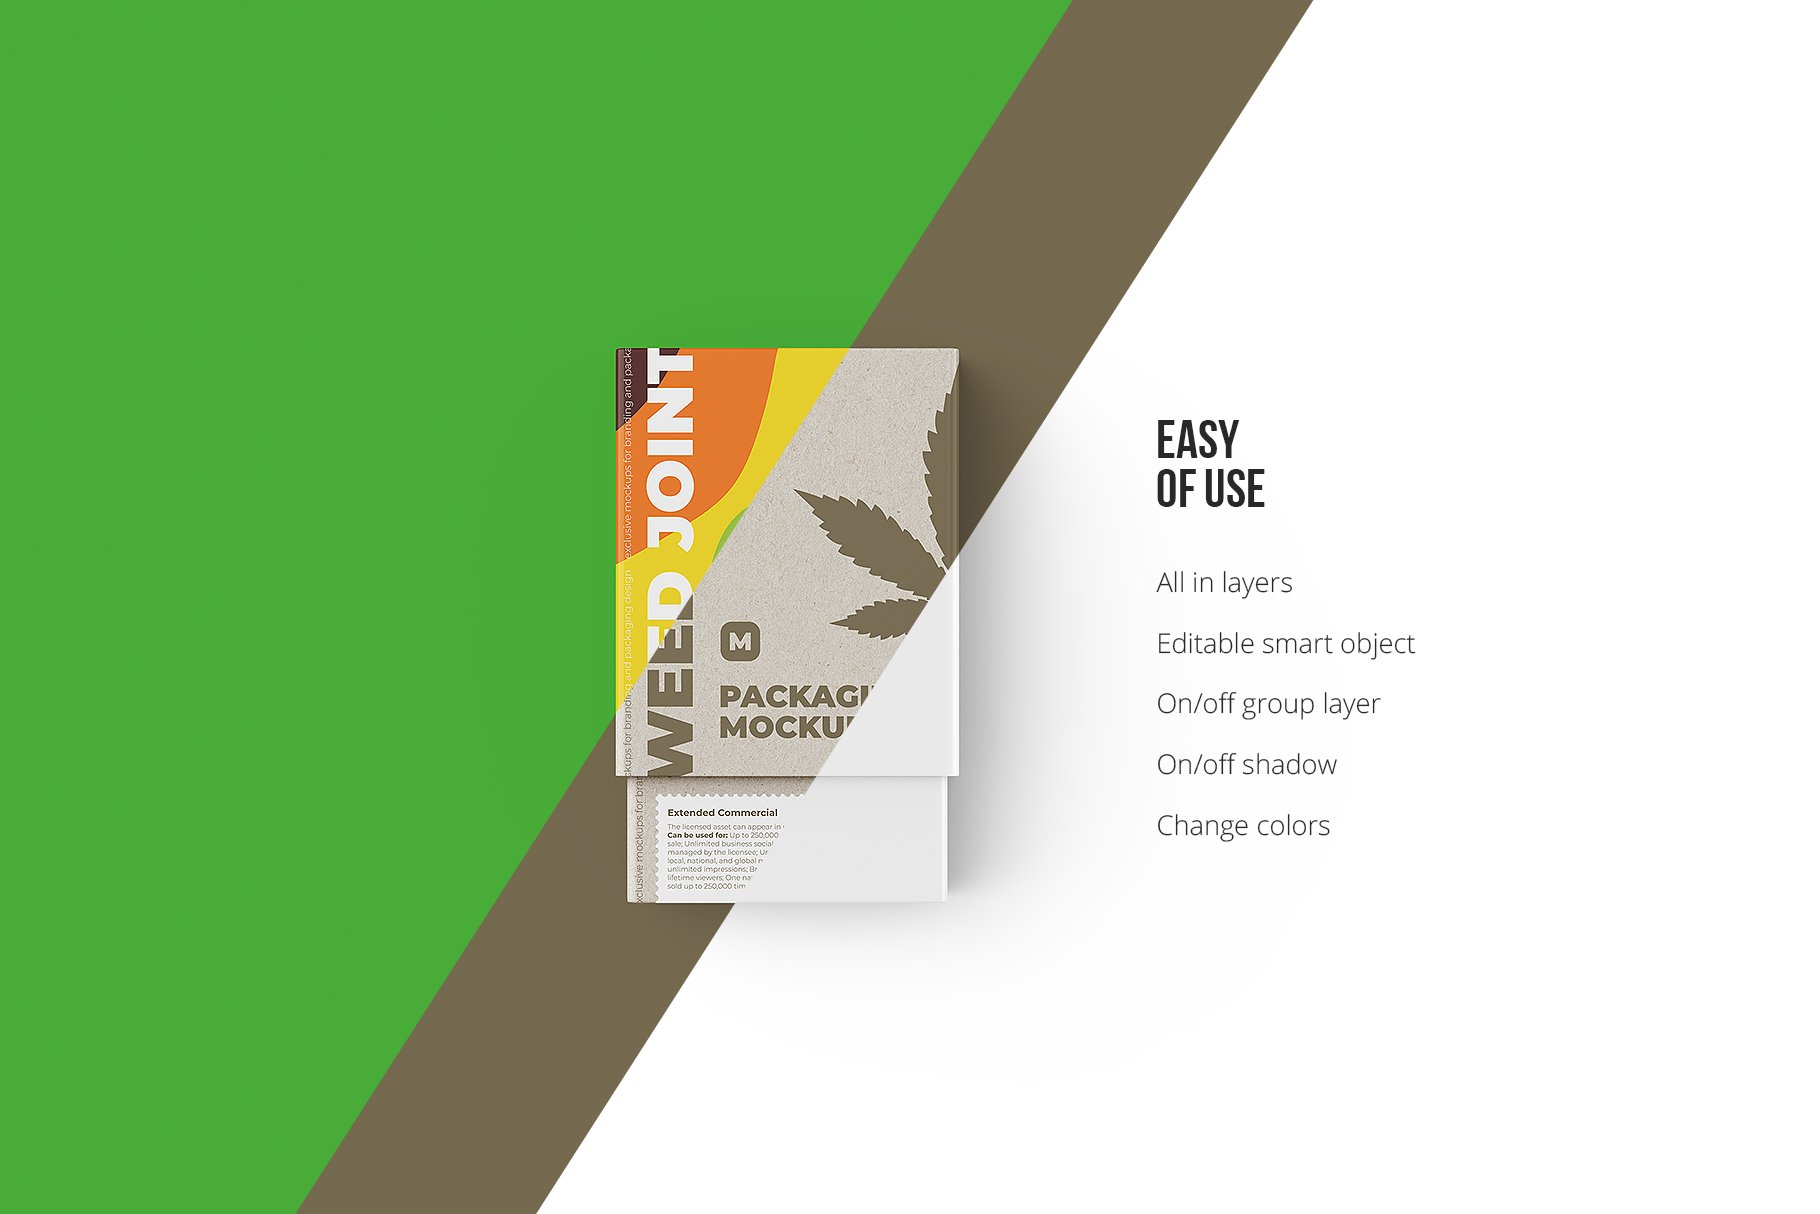 烟草香烟雪茄包装纸盒设计展示贴图样机 Weed Joint Packaging Mockup插图5